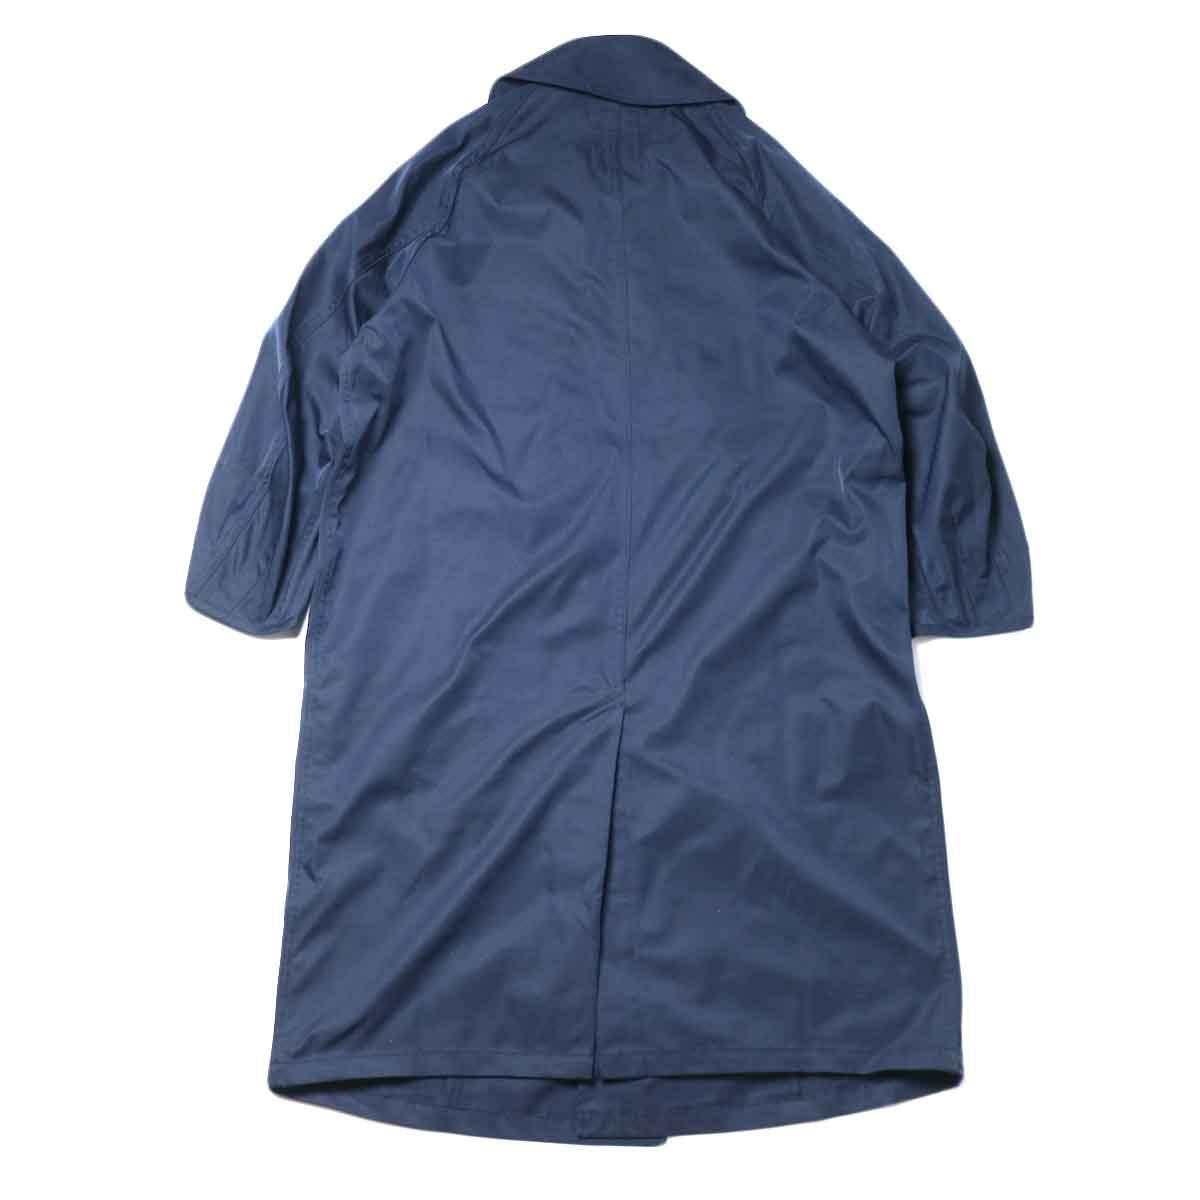 KHA:KI / BELTED WRAP TRENCH COAT (Navy) 背面